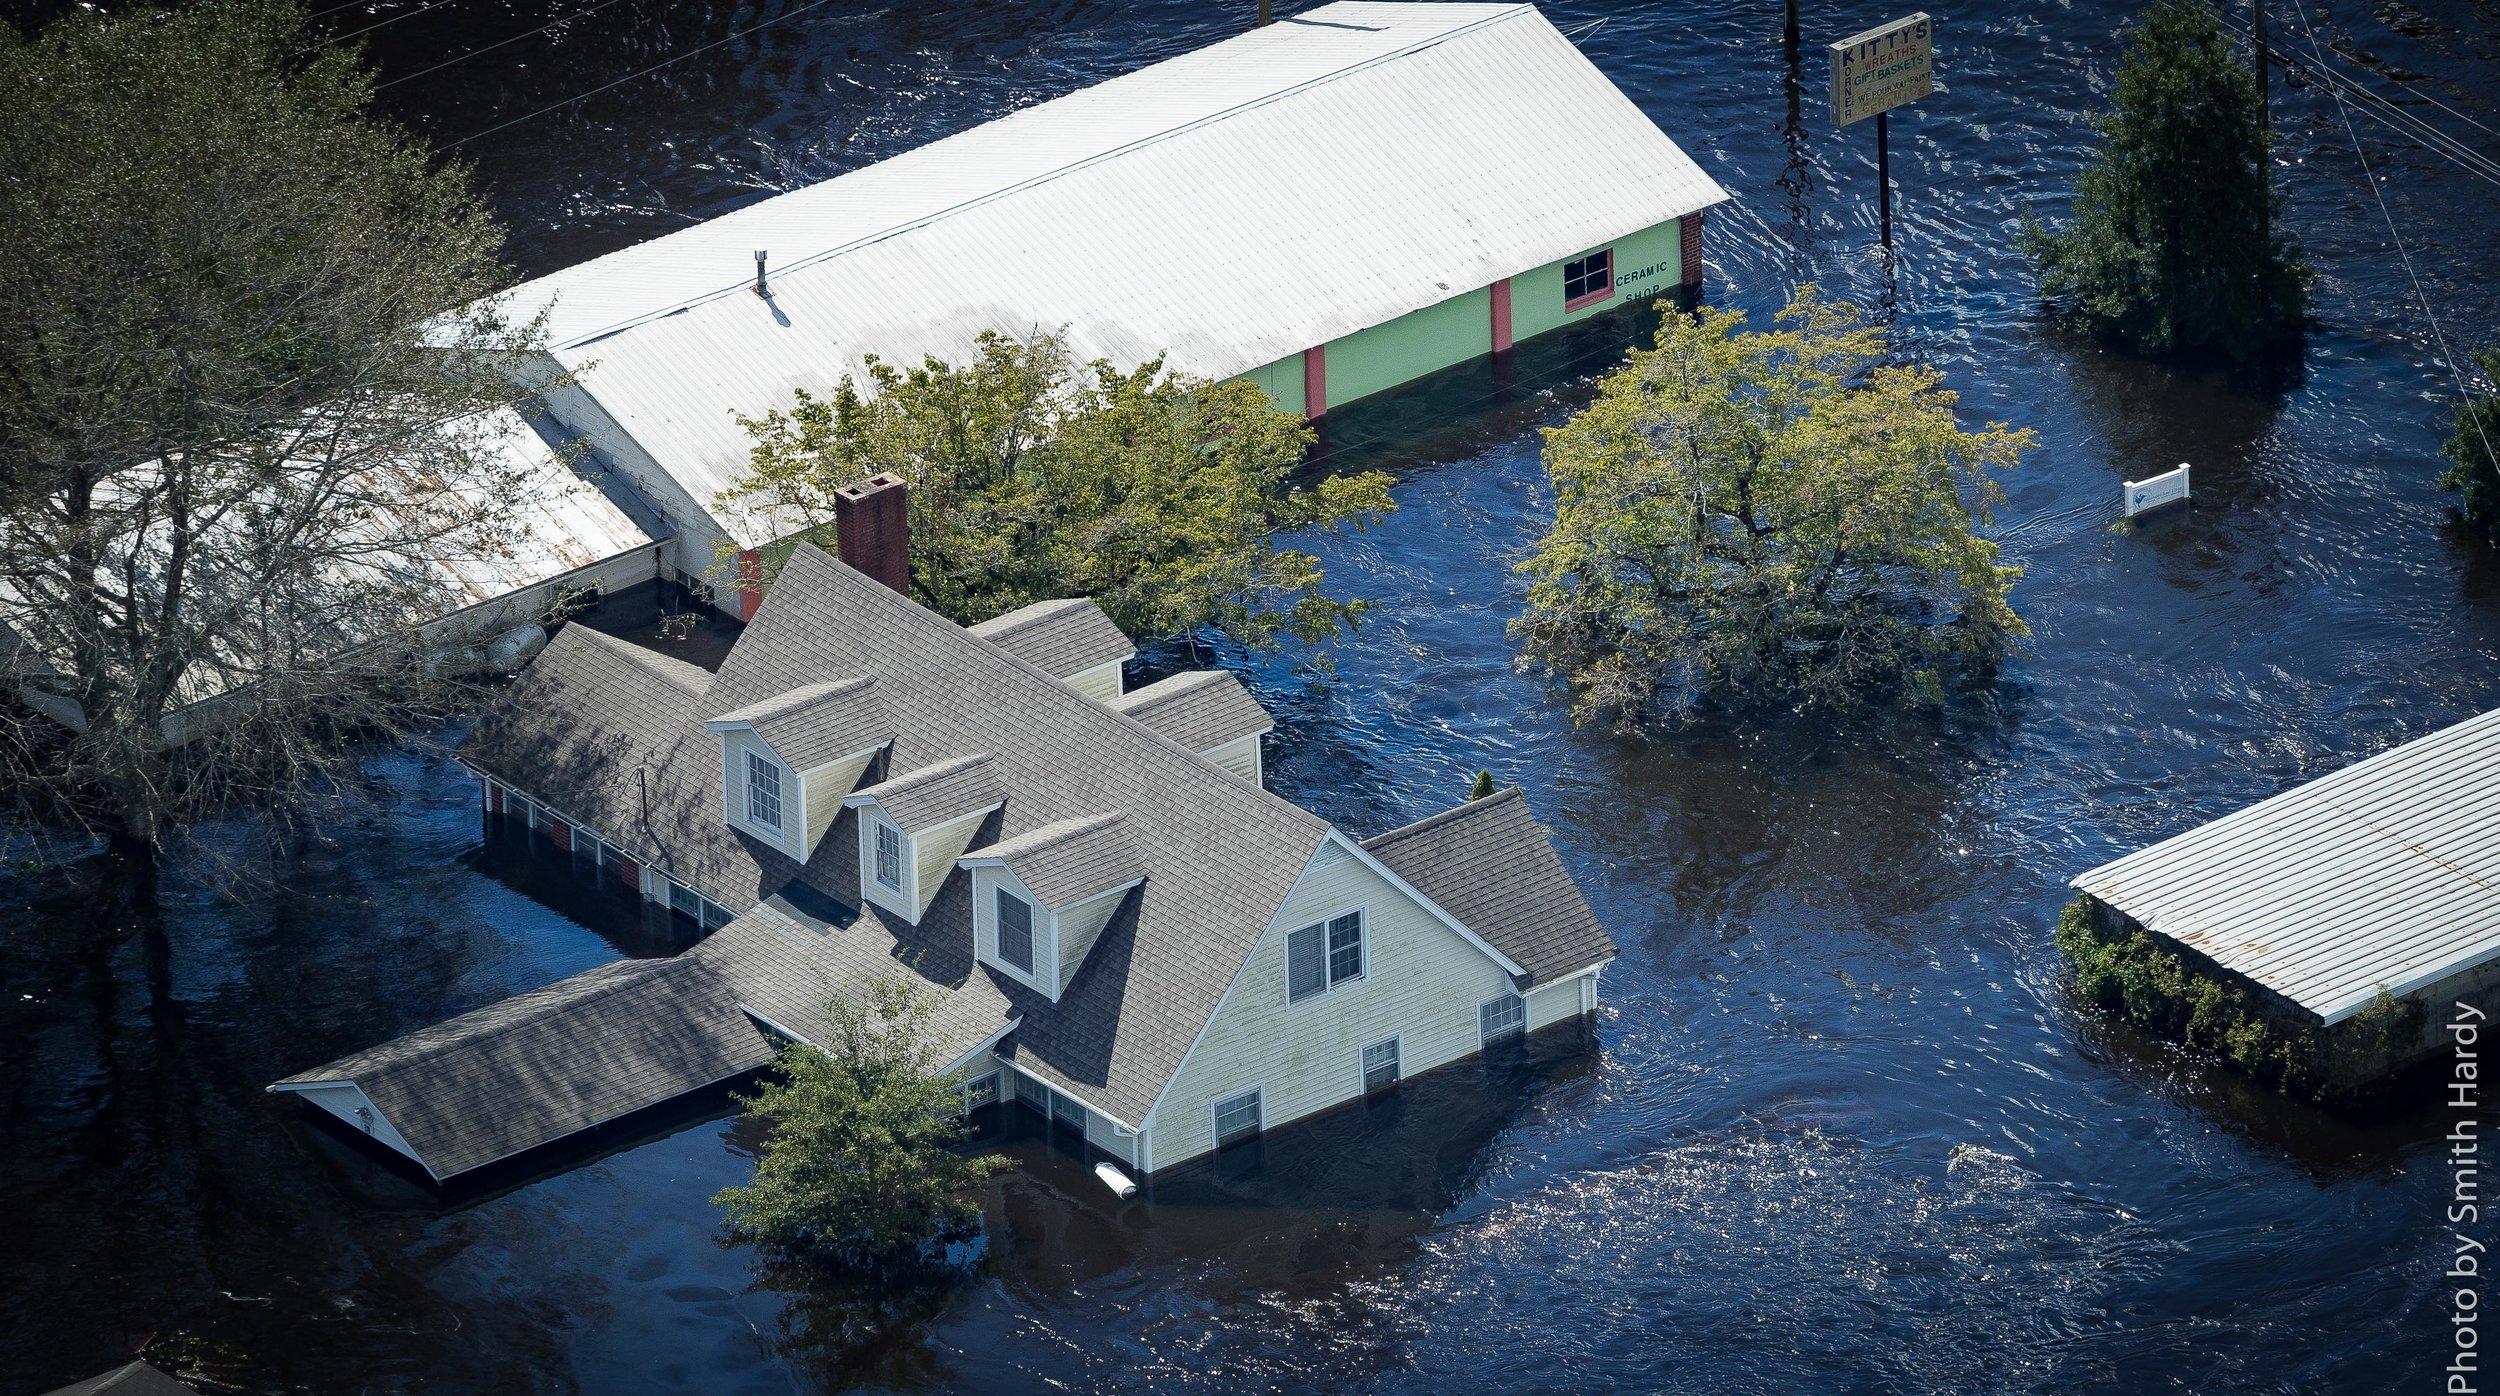 Florence Floods and Beach (16 of 52).jpg